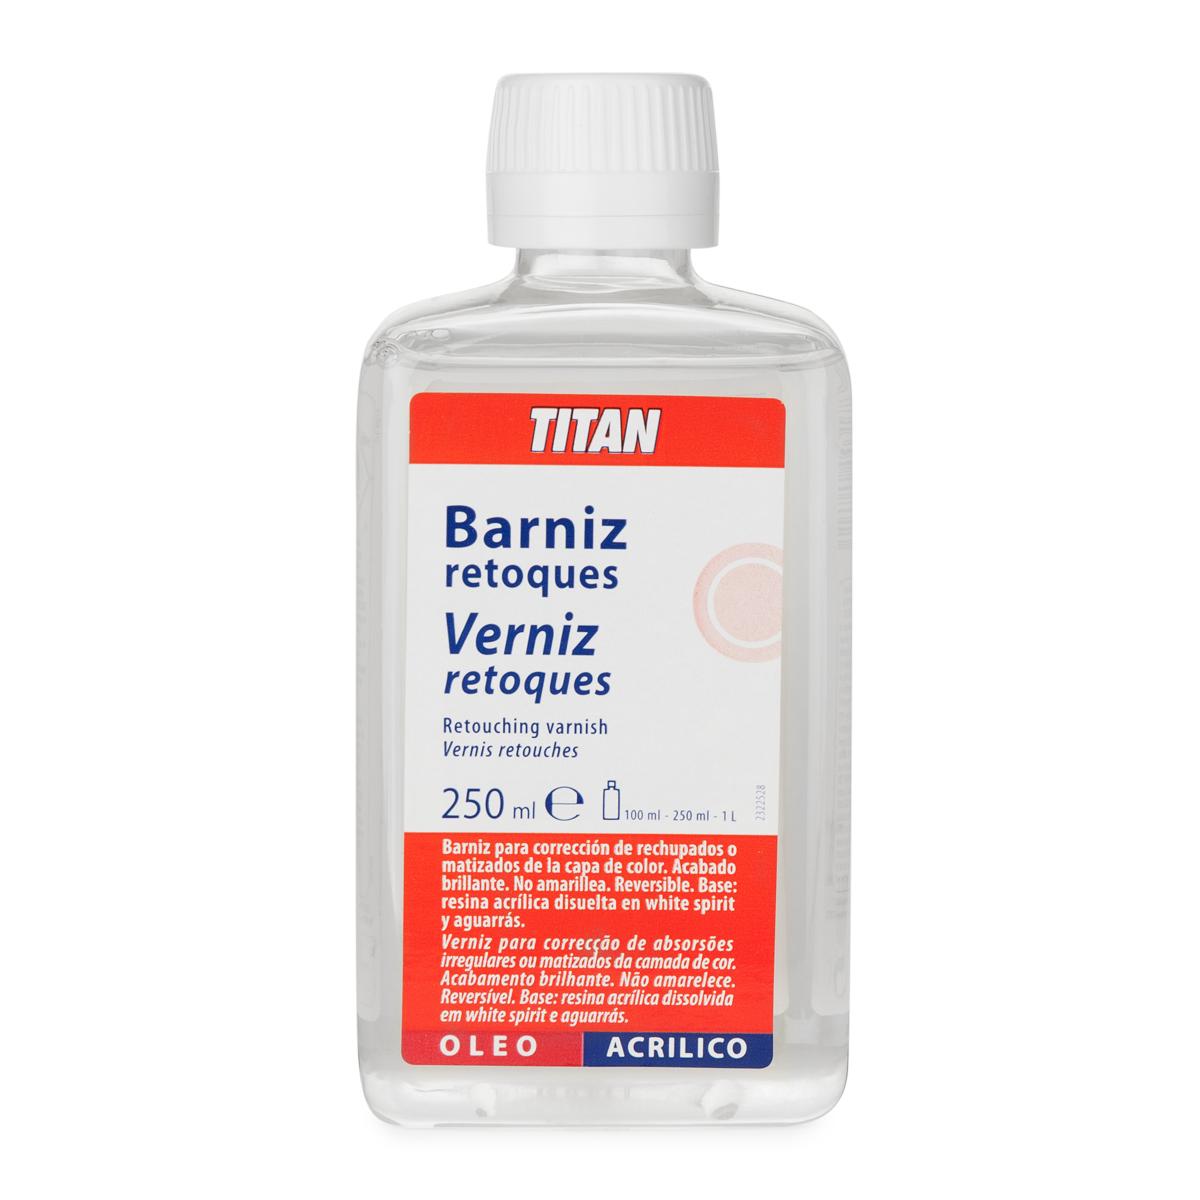 BARNIZ RETOQUES TITAN 250ML